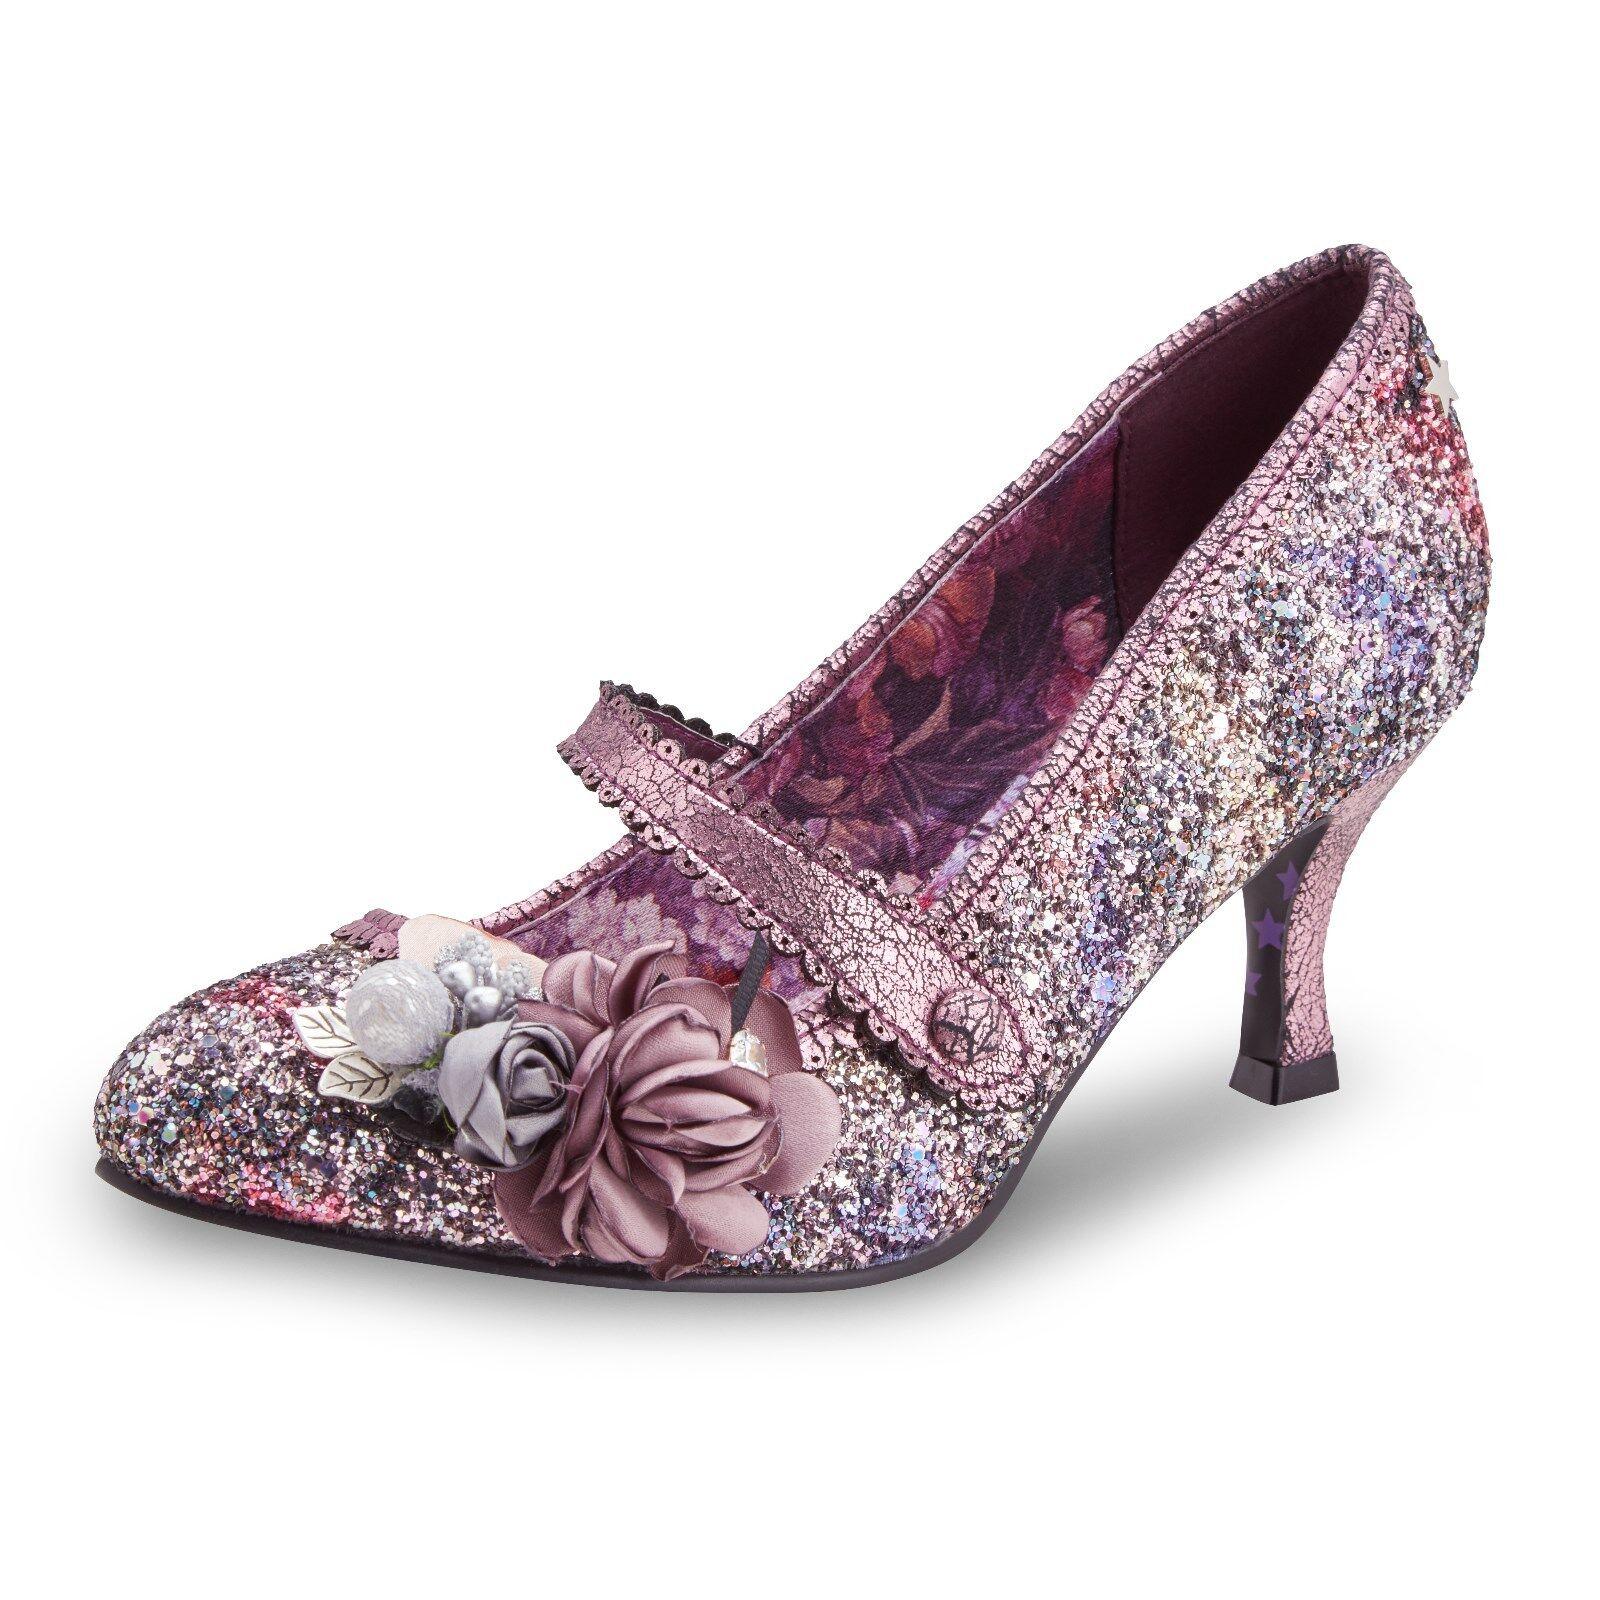 Ladies Joe Browns Couture Marietta Shoe Boots Vintage Quirky Retro Sizes 4-8